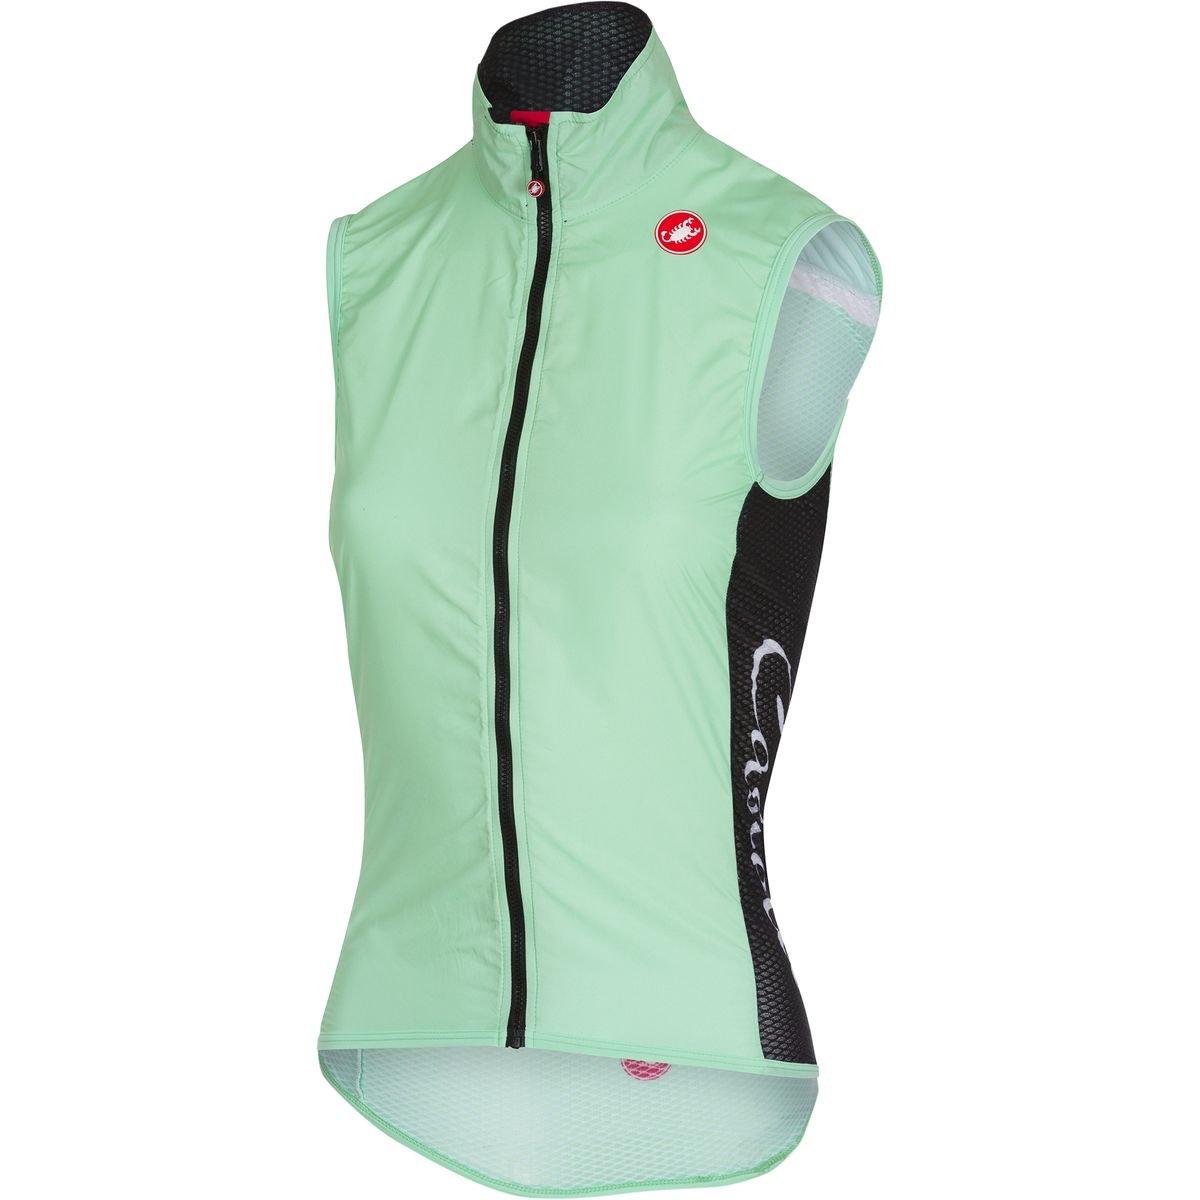 Castelli Pro Light Wind Vest - Women's Pastel Mint, XS